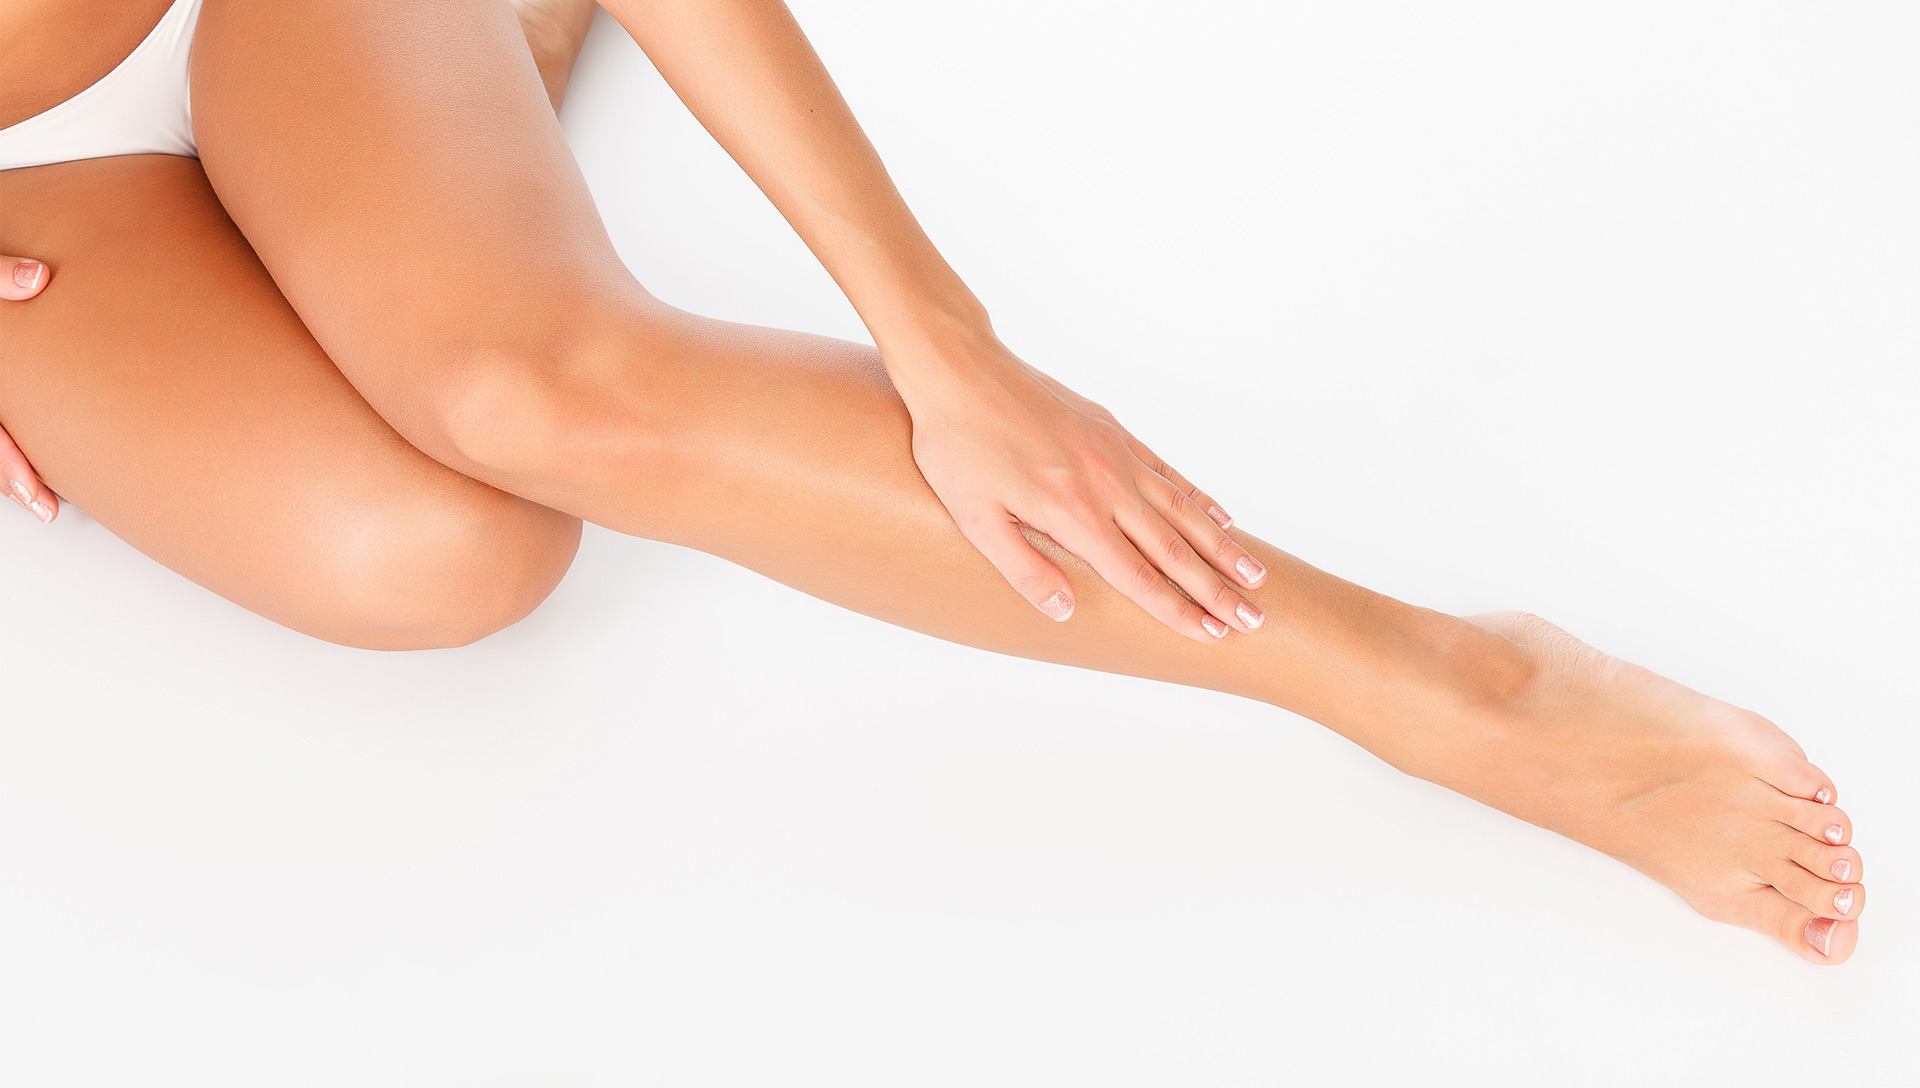 piel deshidratada causas síntomas características